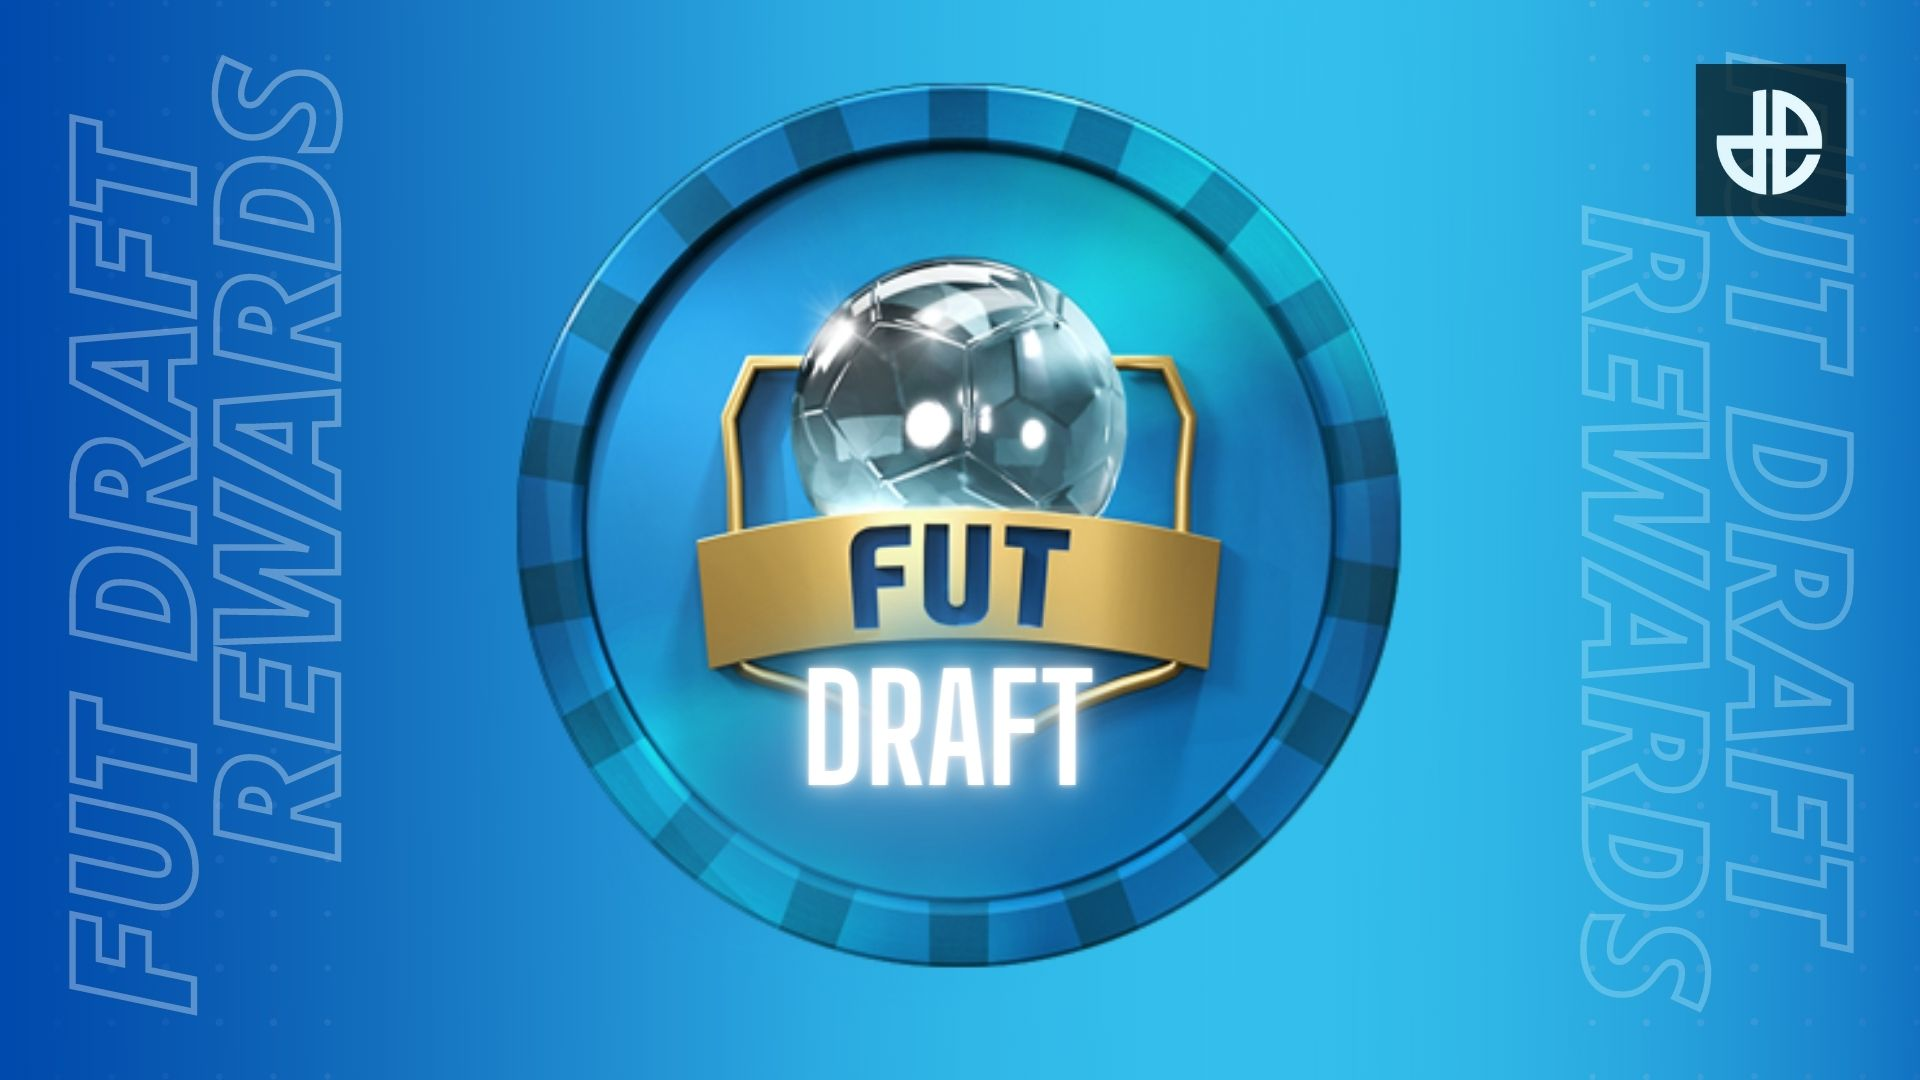 FIFA 21 FUT Draft Ultimate Team rewards